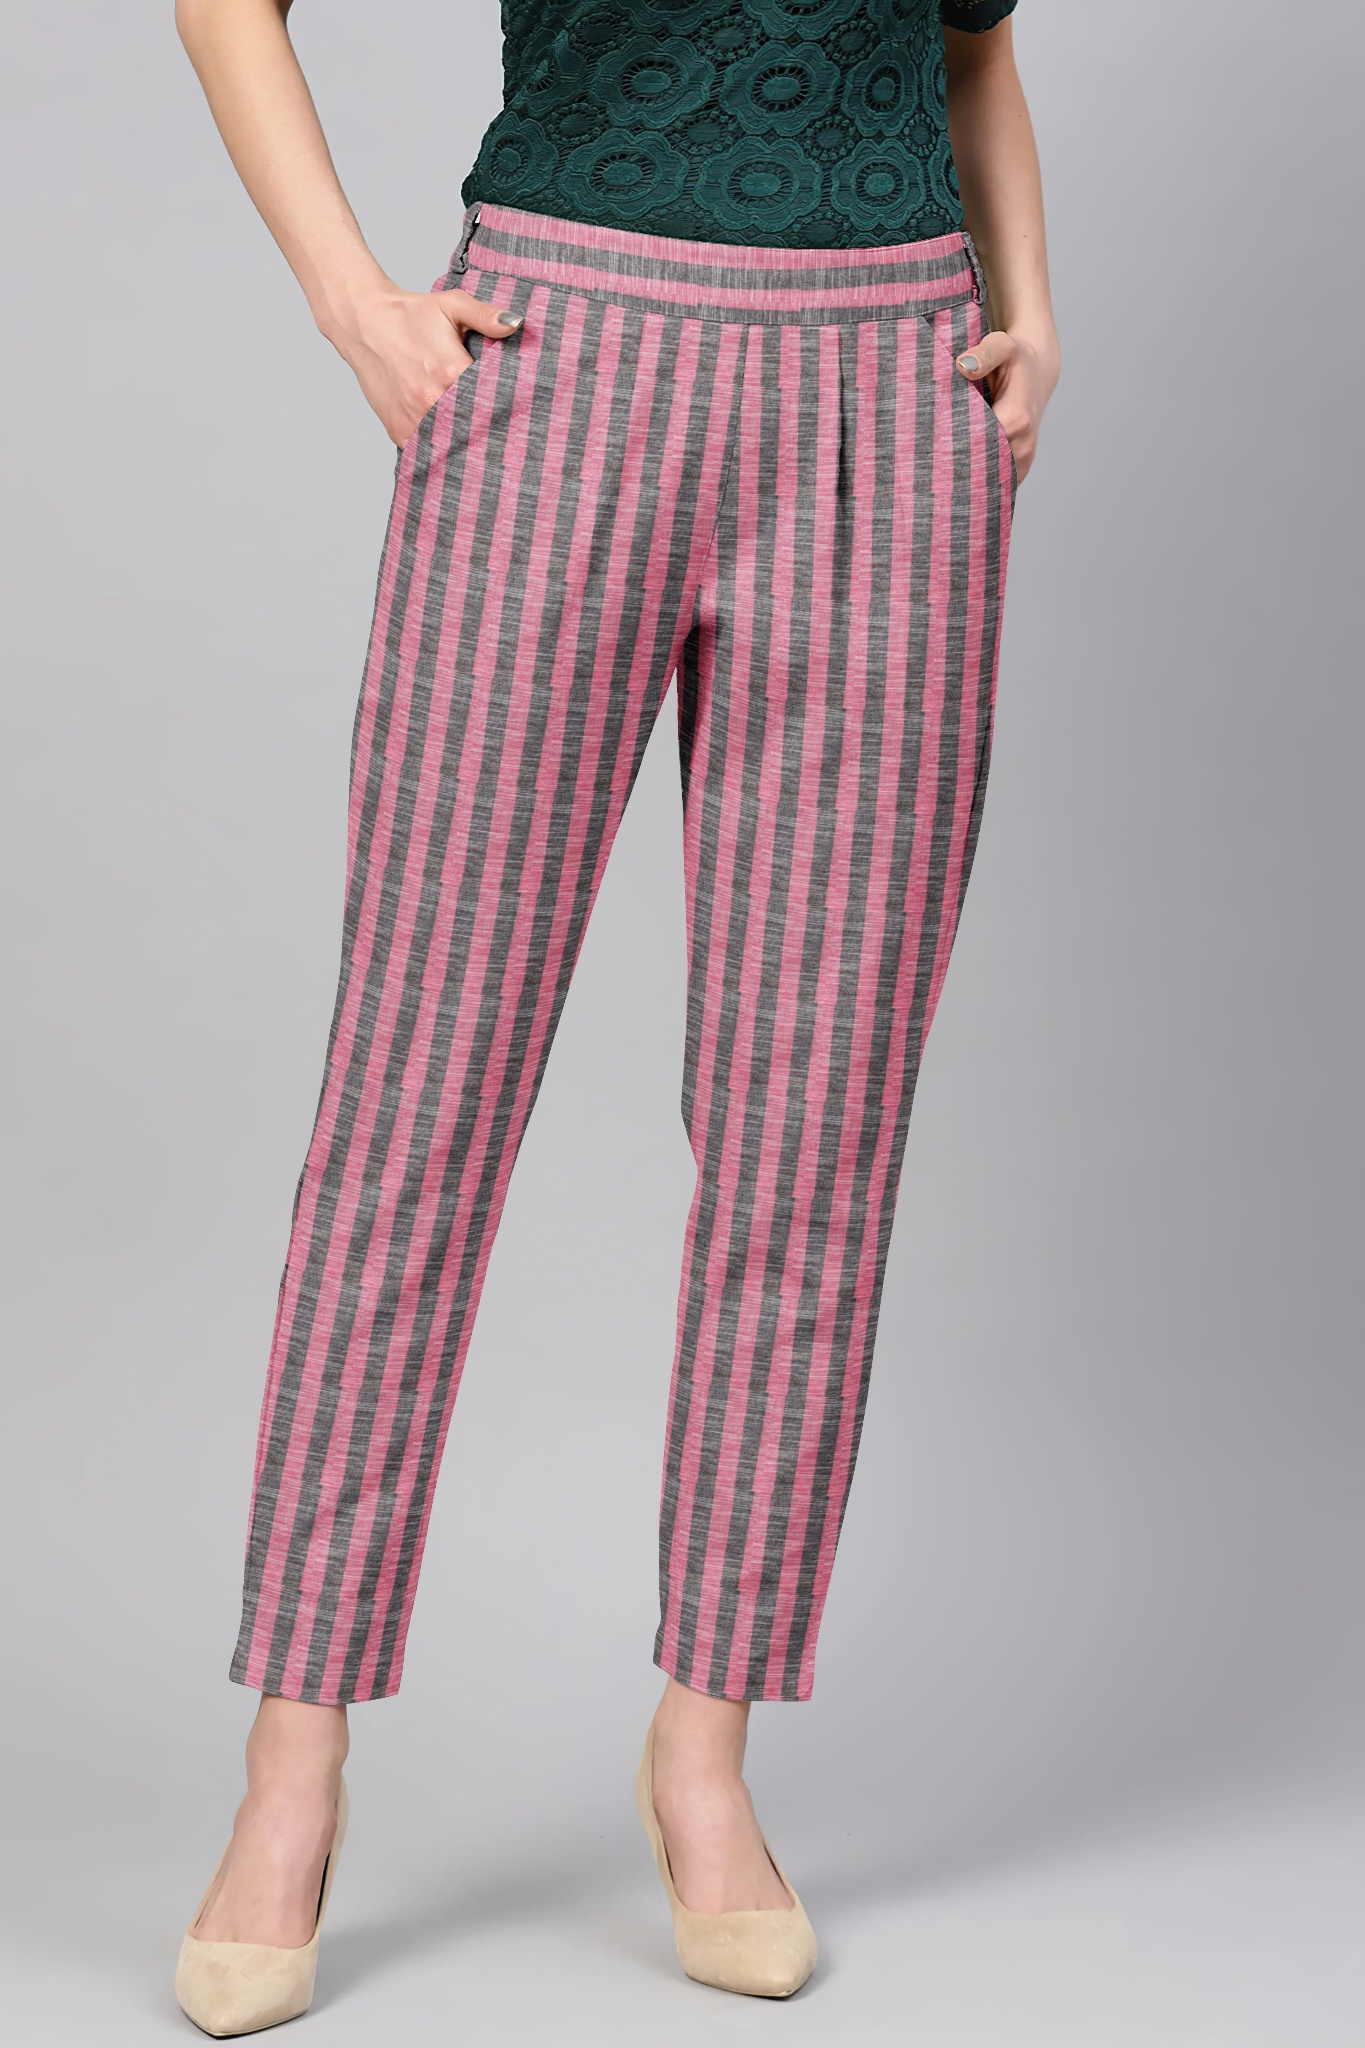 /home/customer/www/fabartcraft.com/public_html/uploadshttps://www.shopolics.com/uploads/images/medium/Pink-Gray-Cotton-Stripe-Regular-Fit-Solid-Trouser-36106.jpg